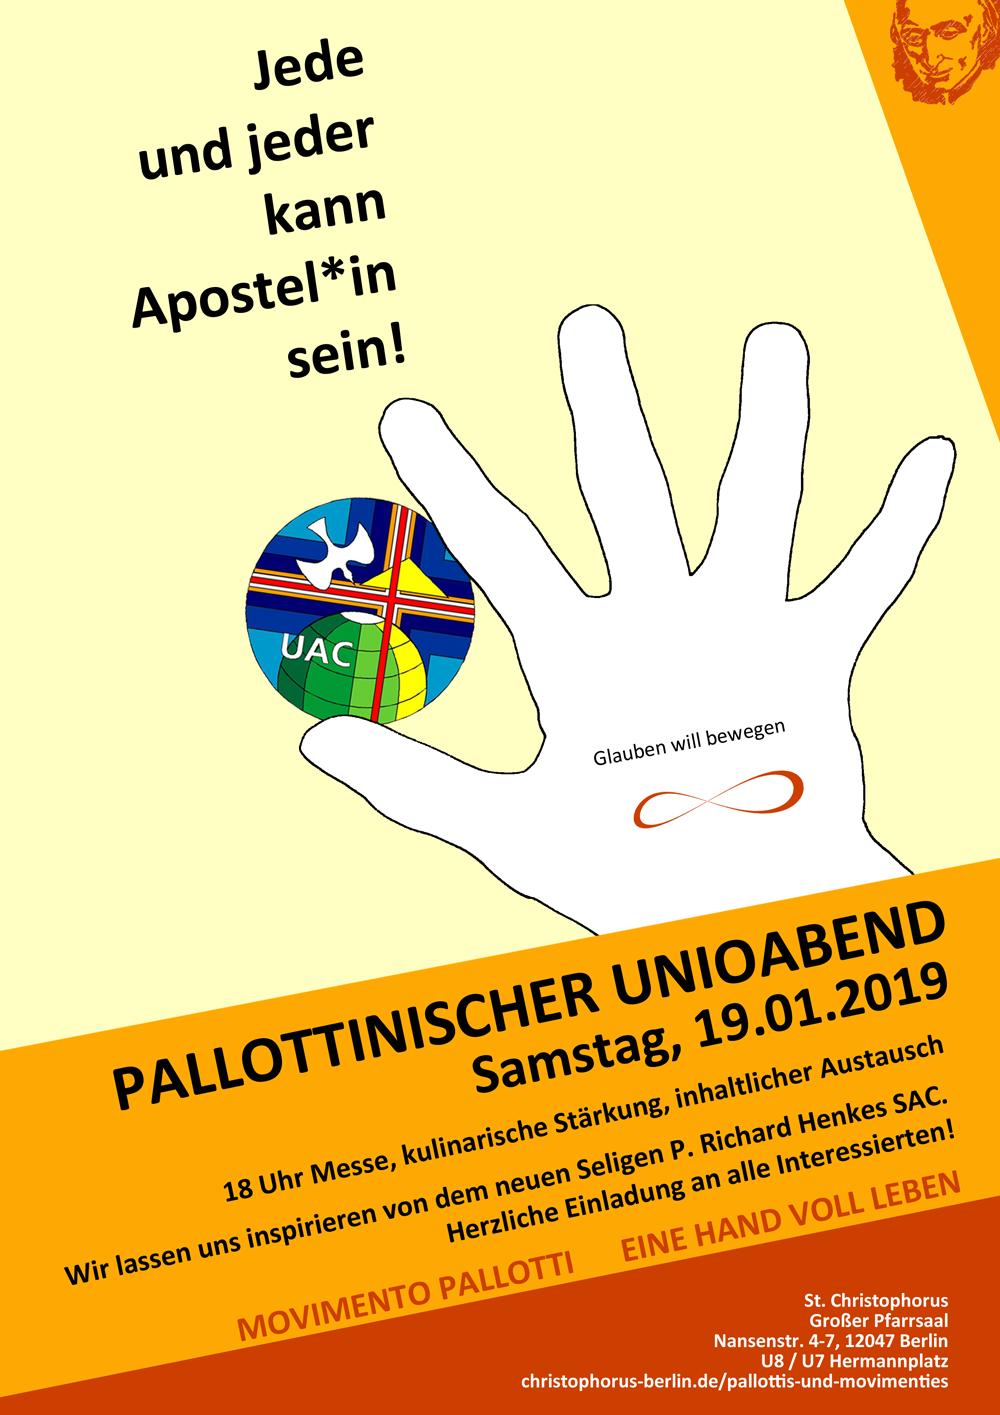 Pallottinischer Unioabend @ St. Christophorus | Berlin | Berlin | Deutschland